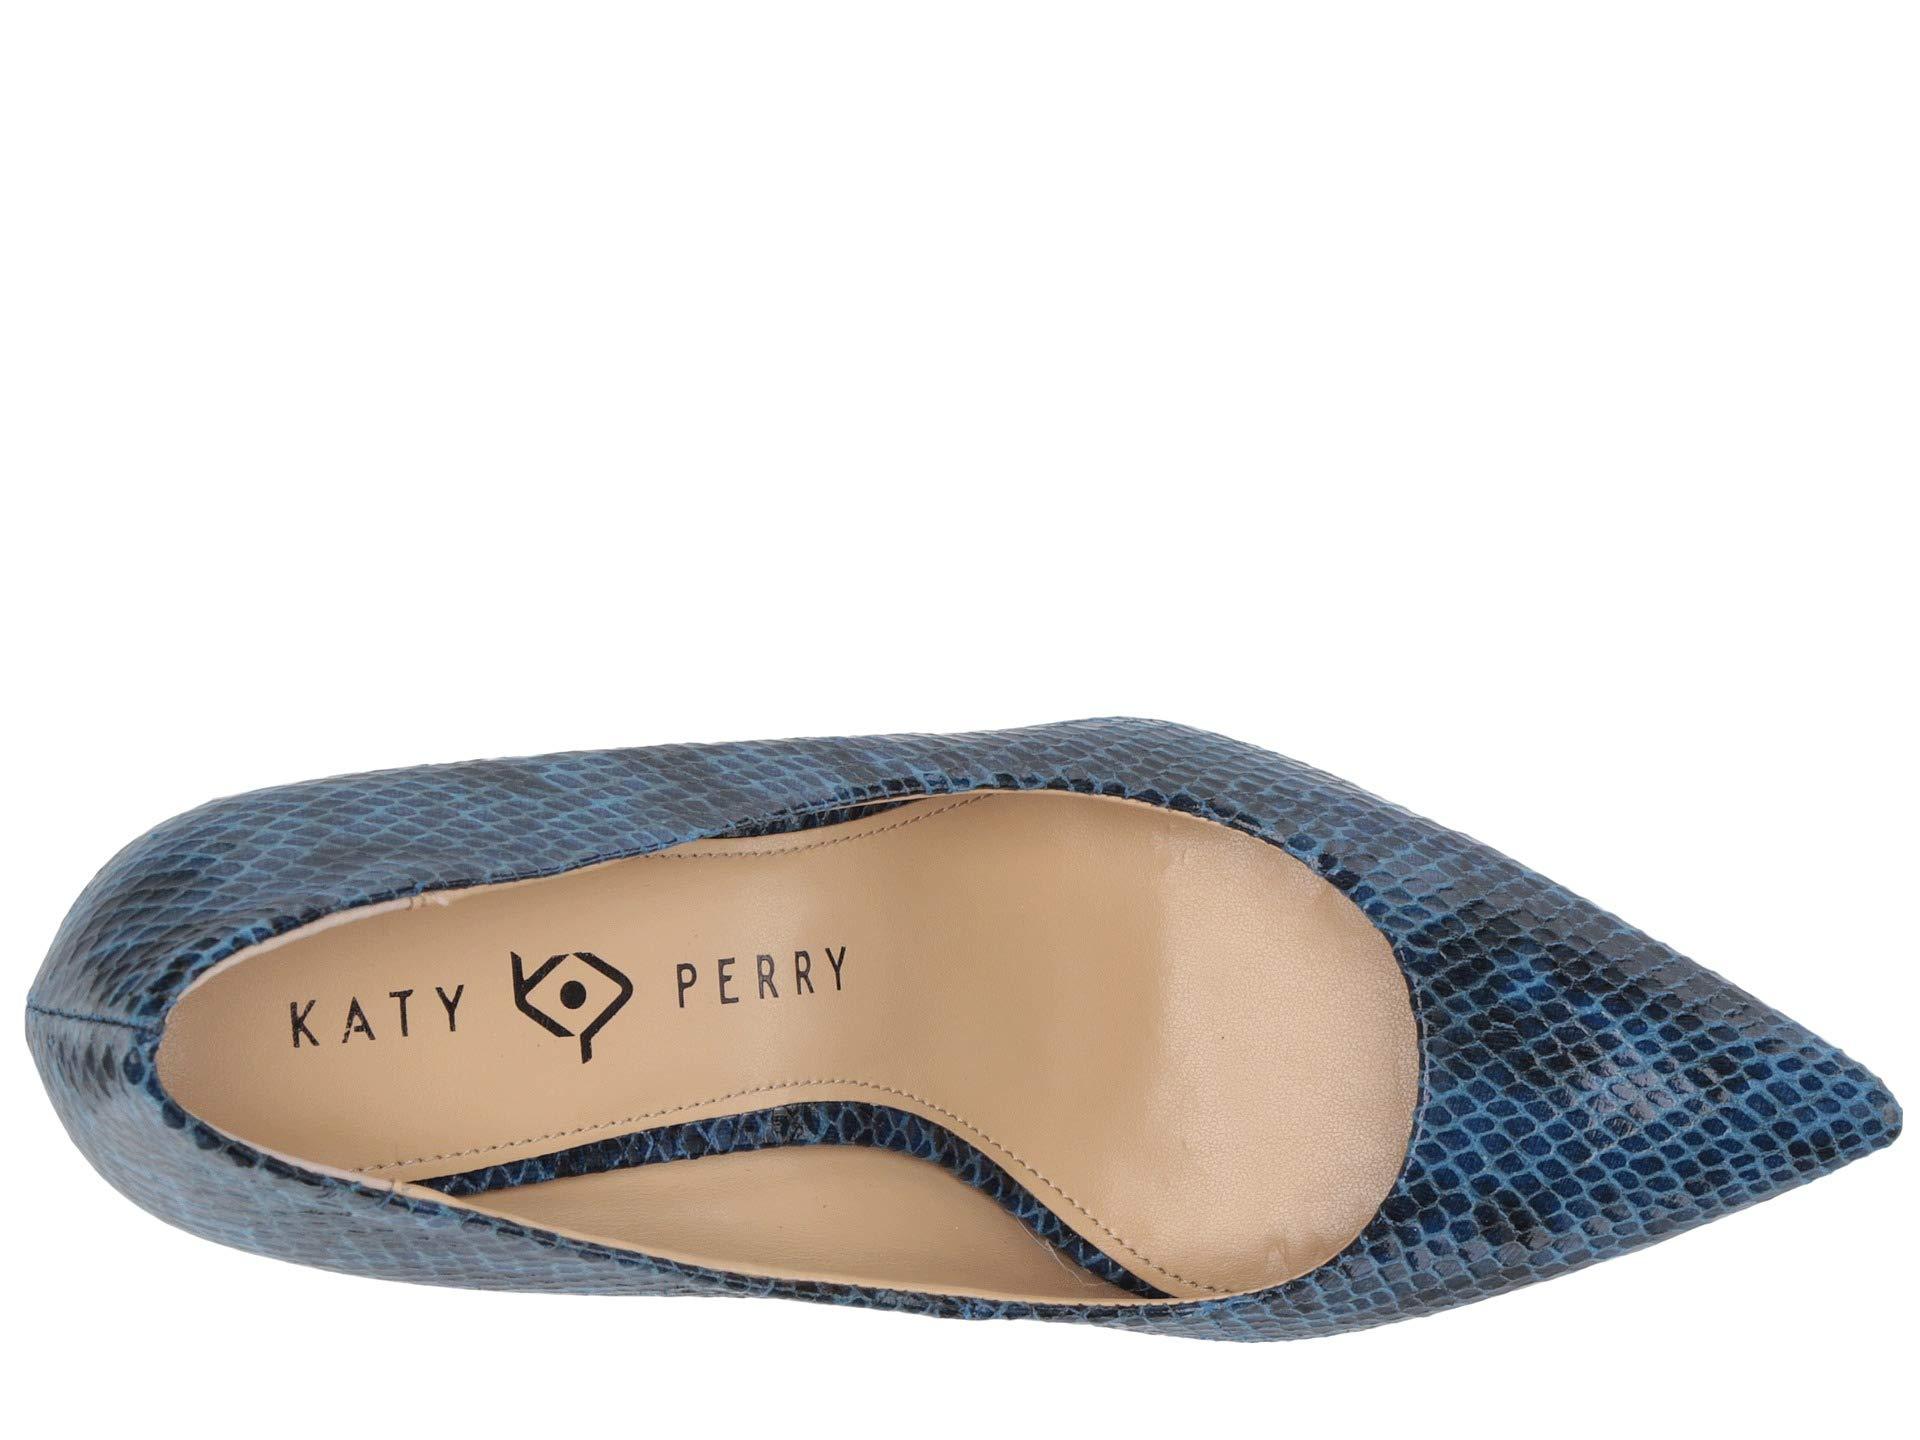 Sissy Print Perry The Katy Snake Blue qz4zaC